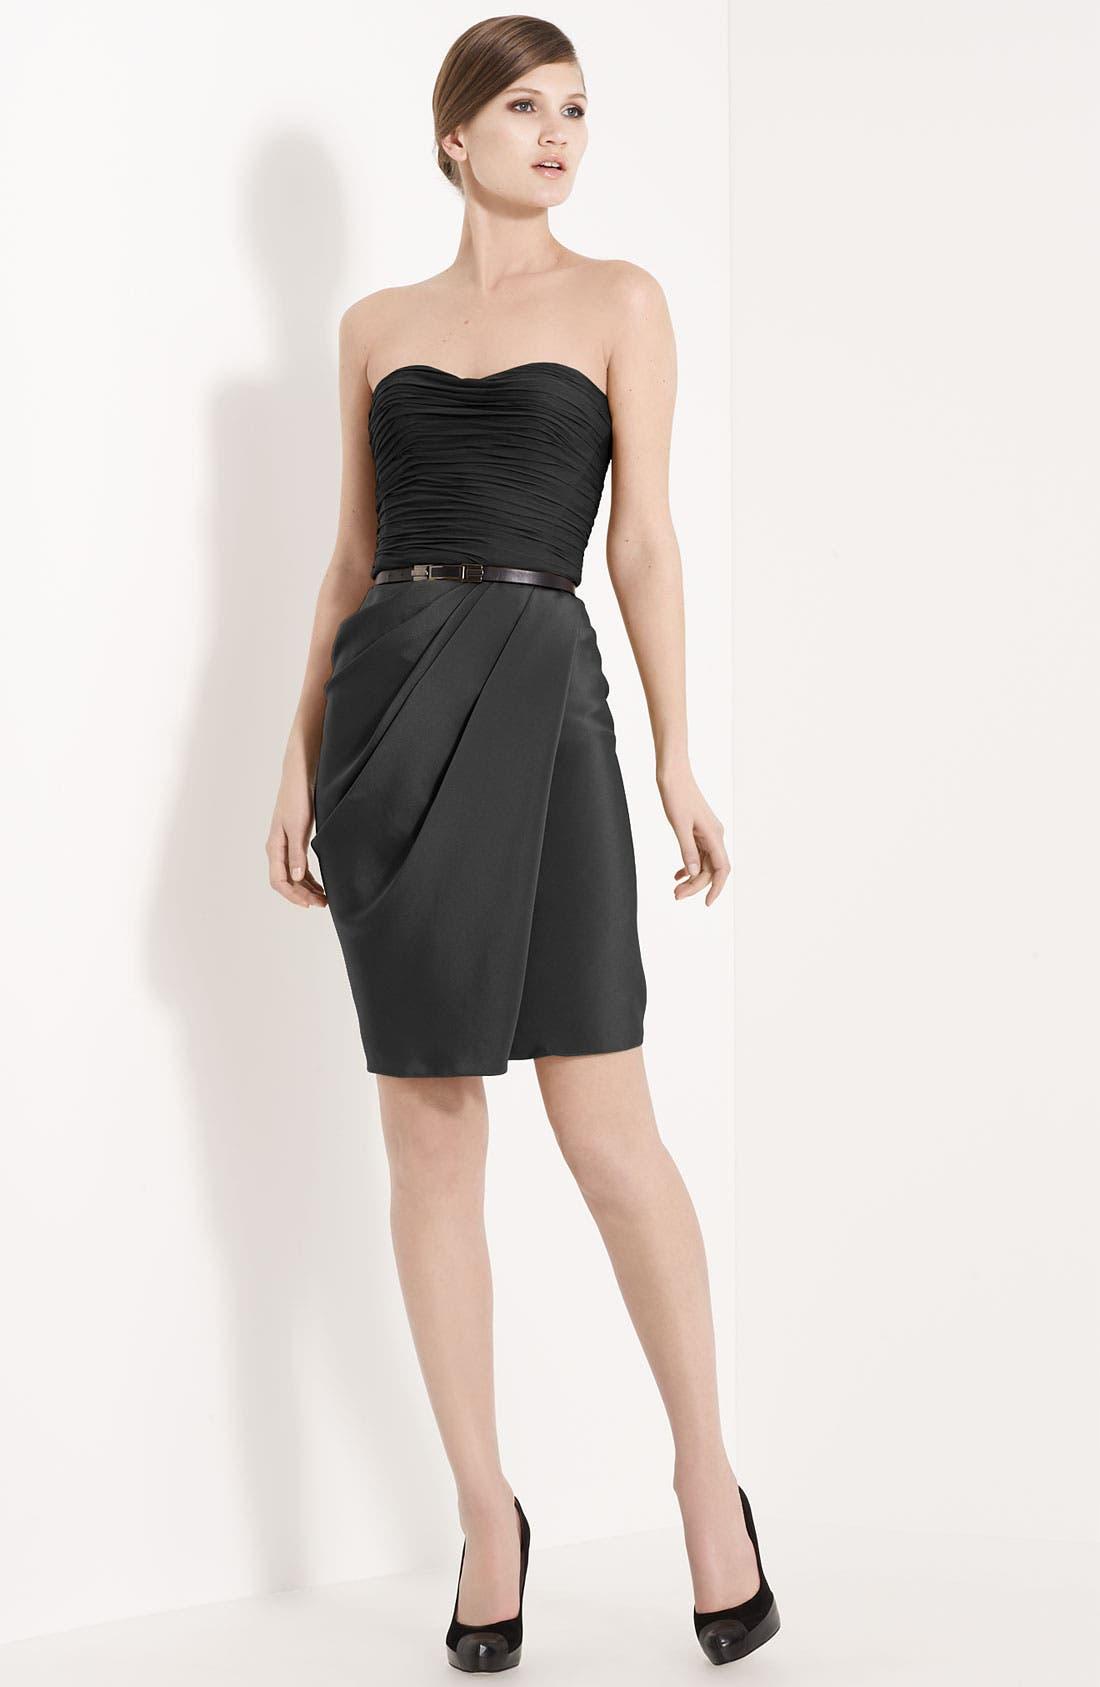 Alternate Image 1 Selected - Jason Wu Belted Strapless Dress